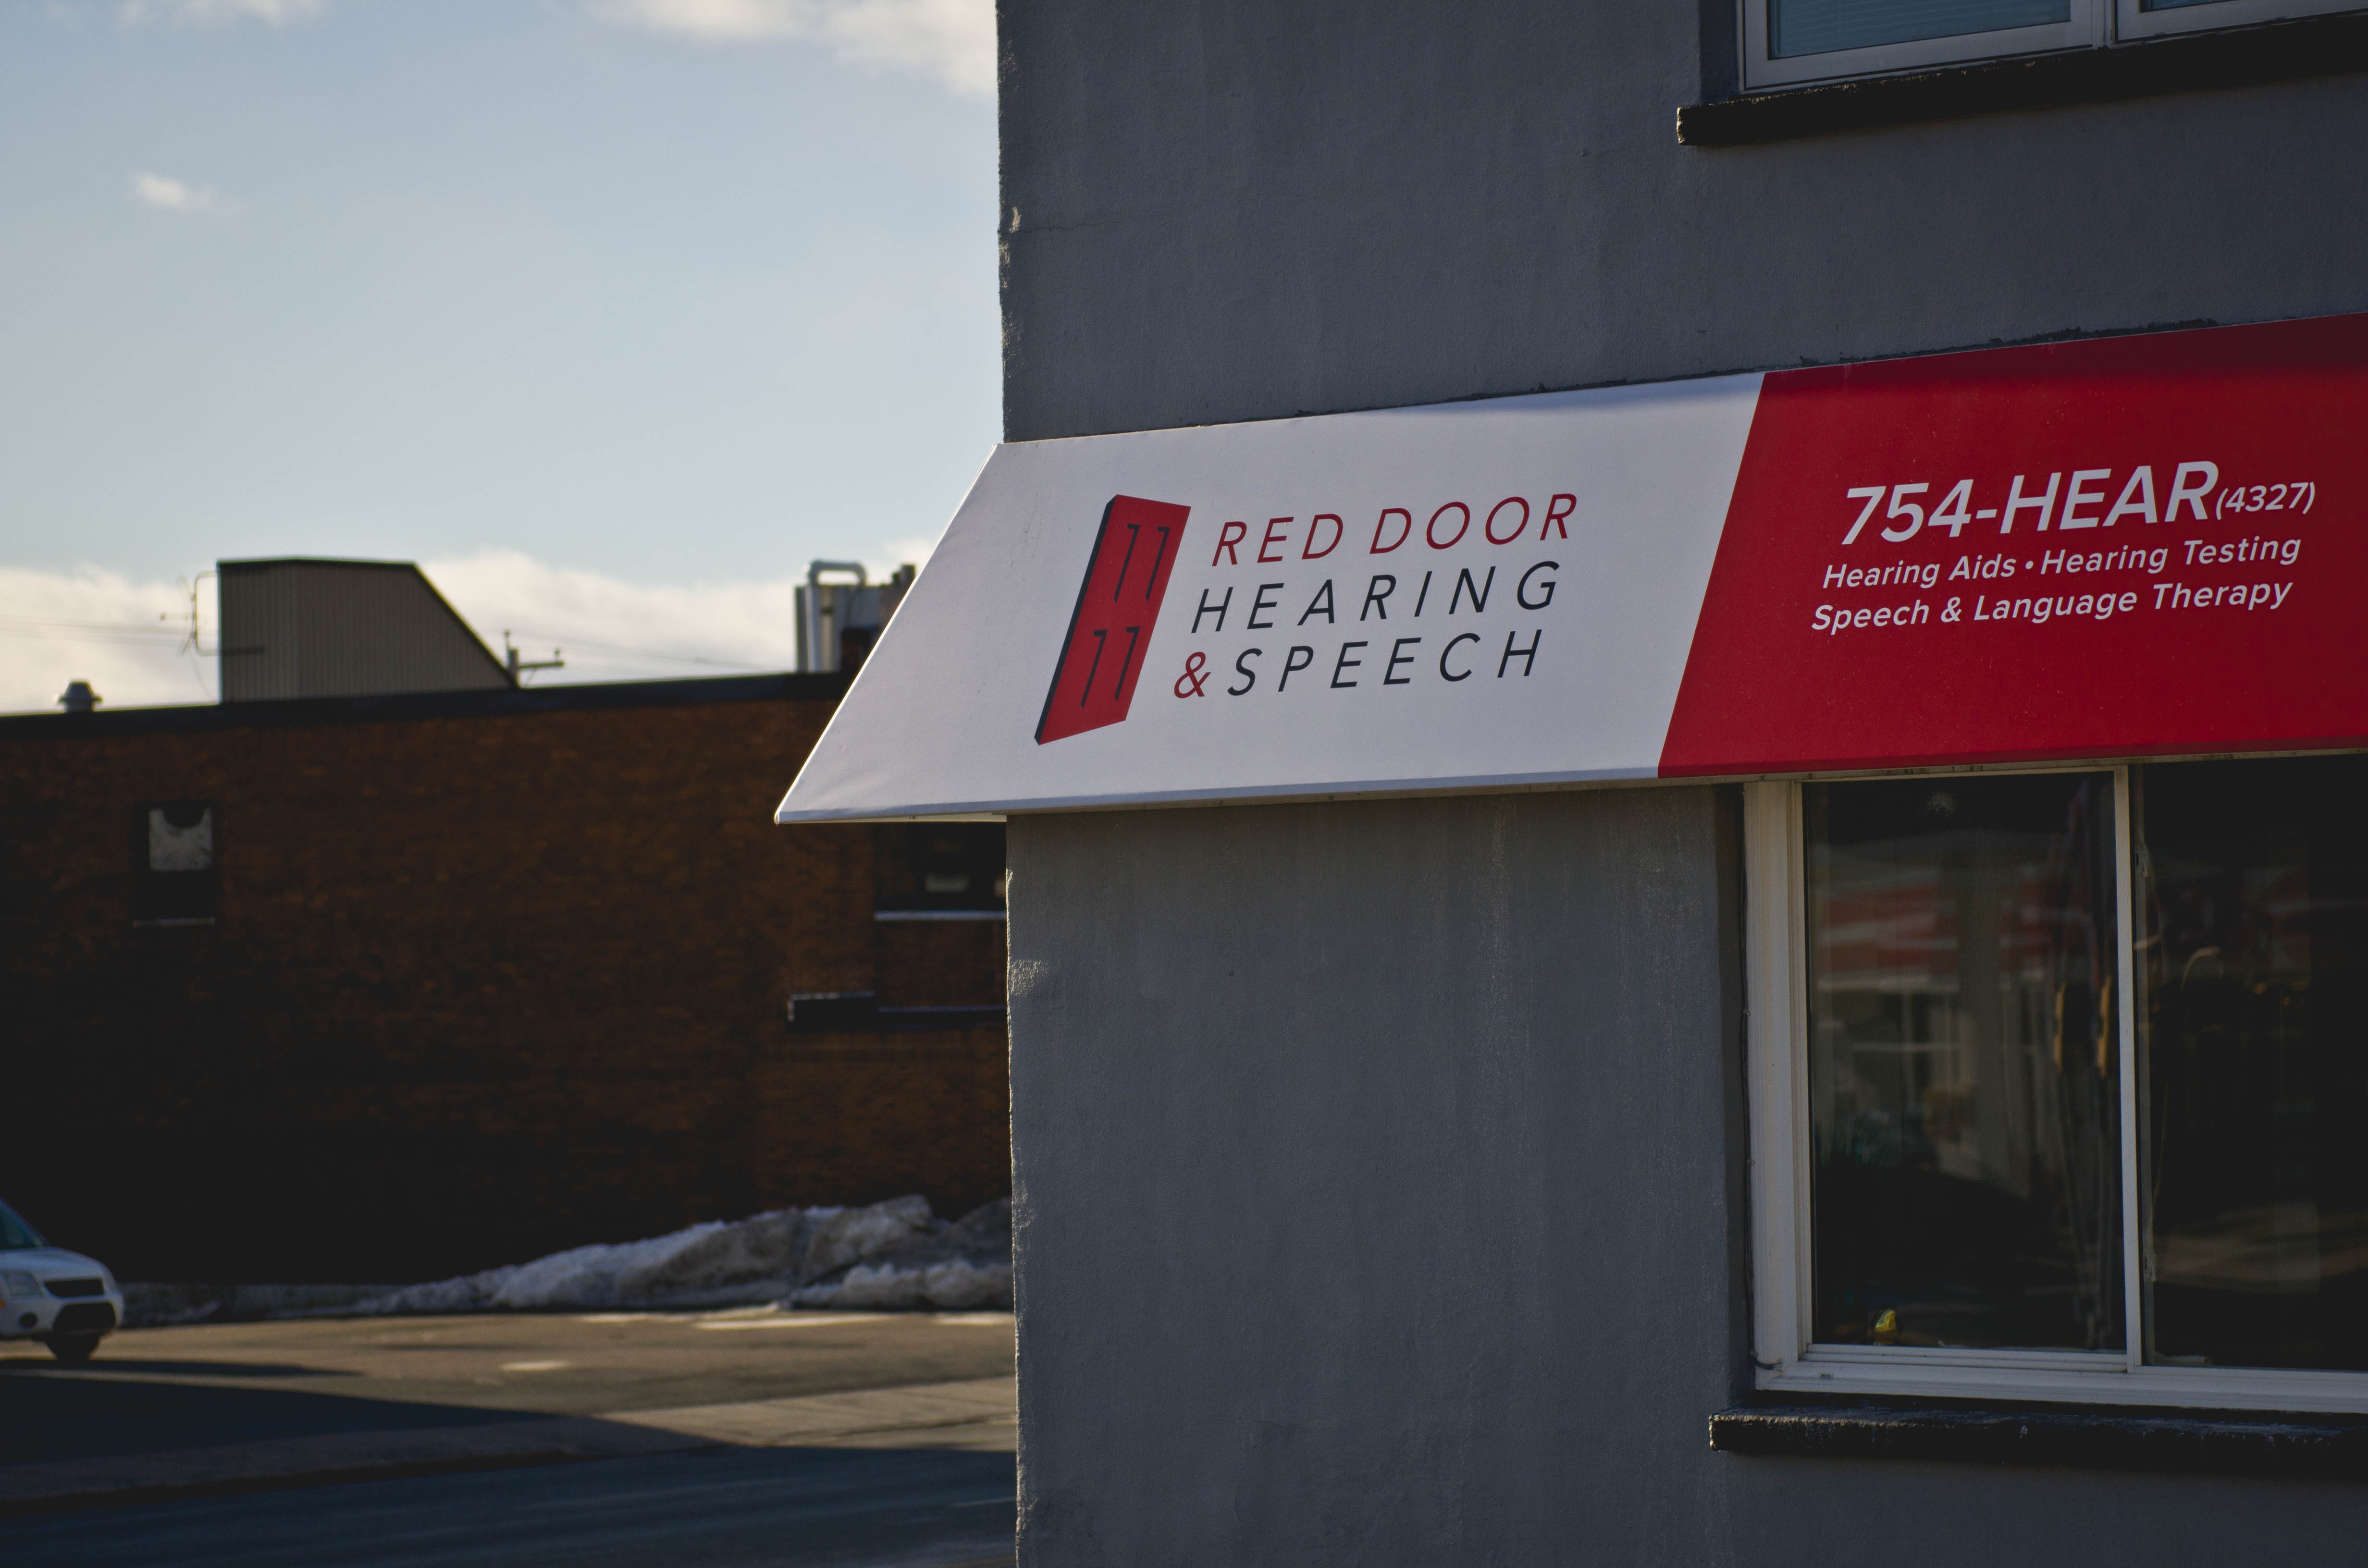 Red Door Hearing awning